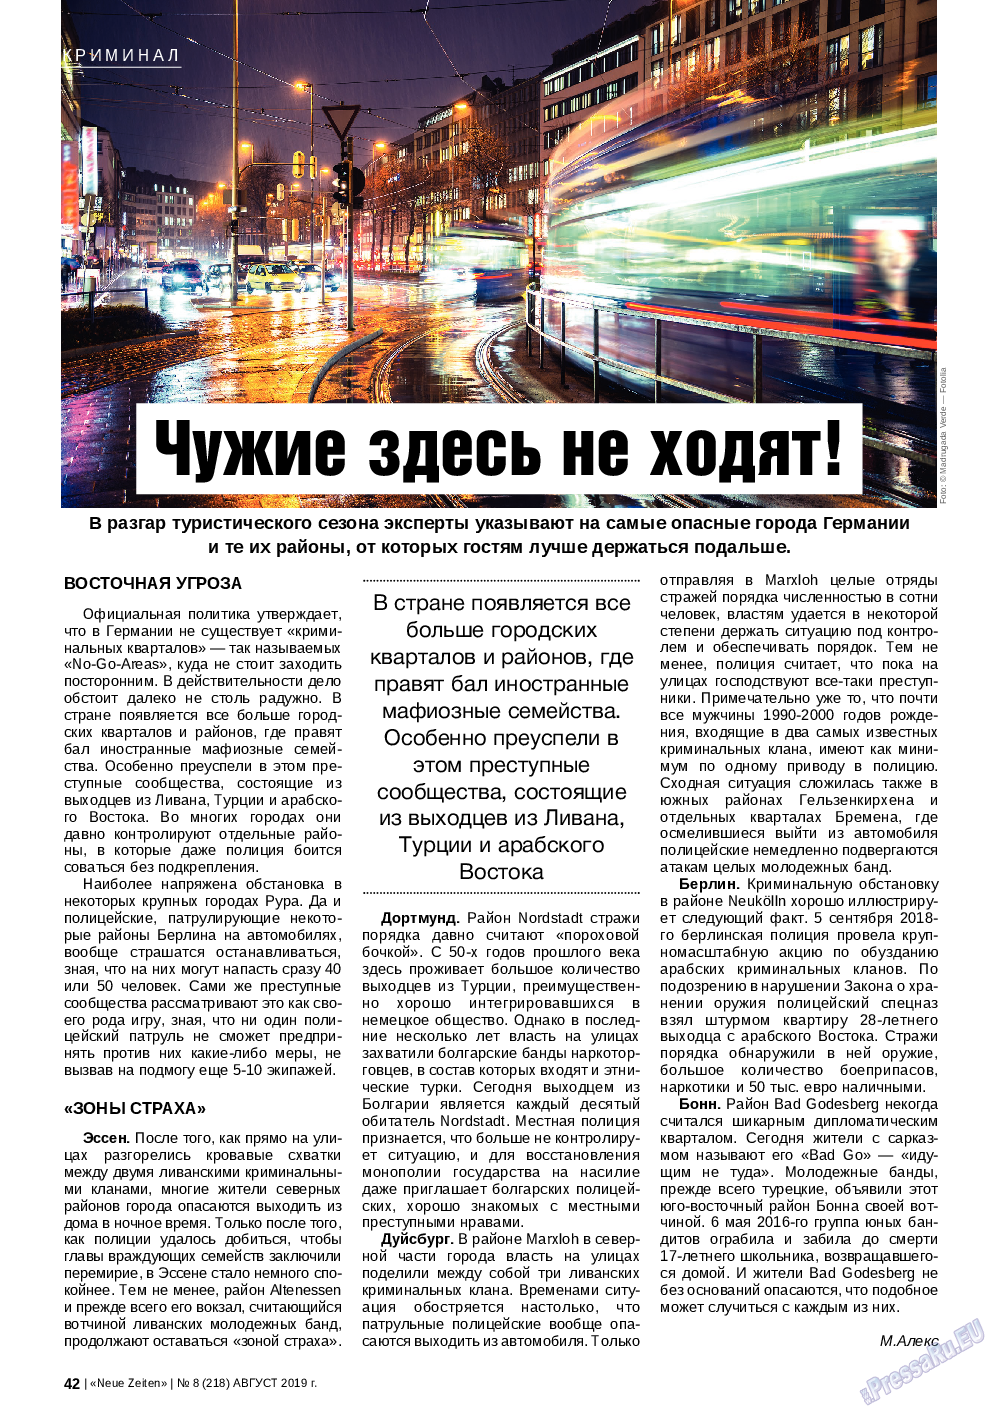 Neue Zeiten (журнал). 2019 год, номер 8, стр. 42